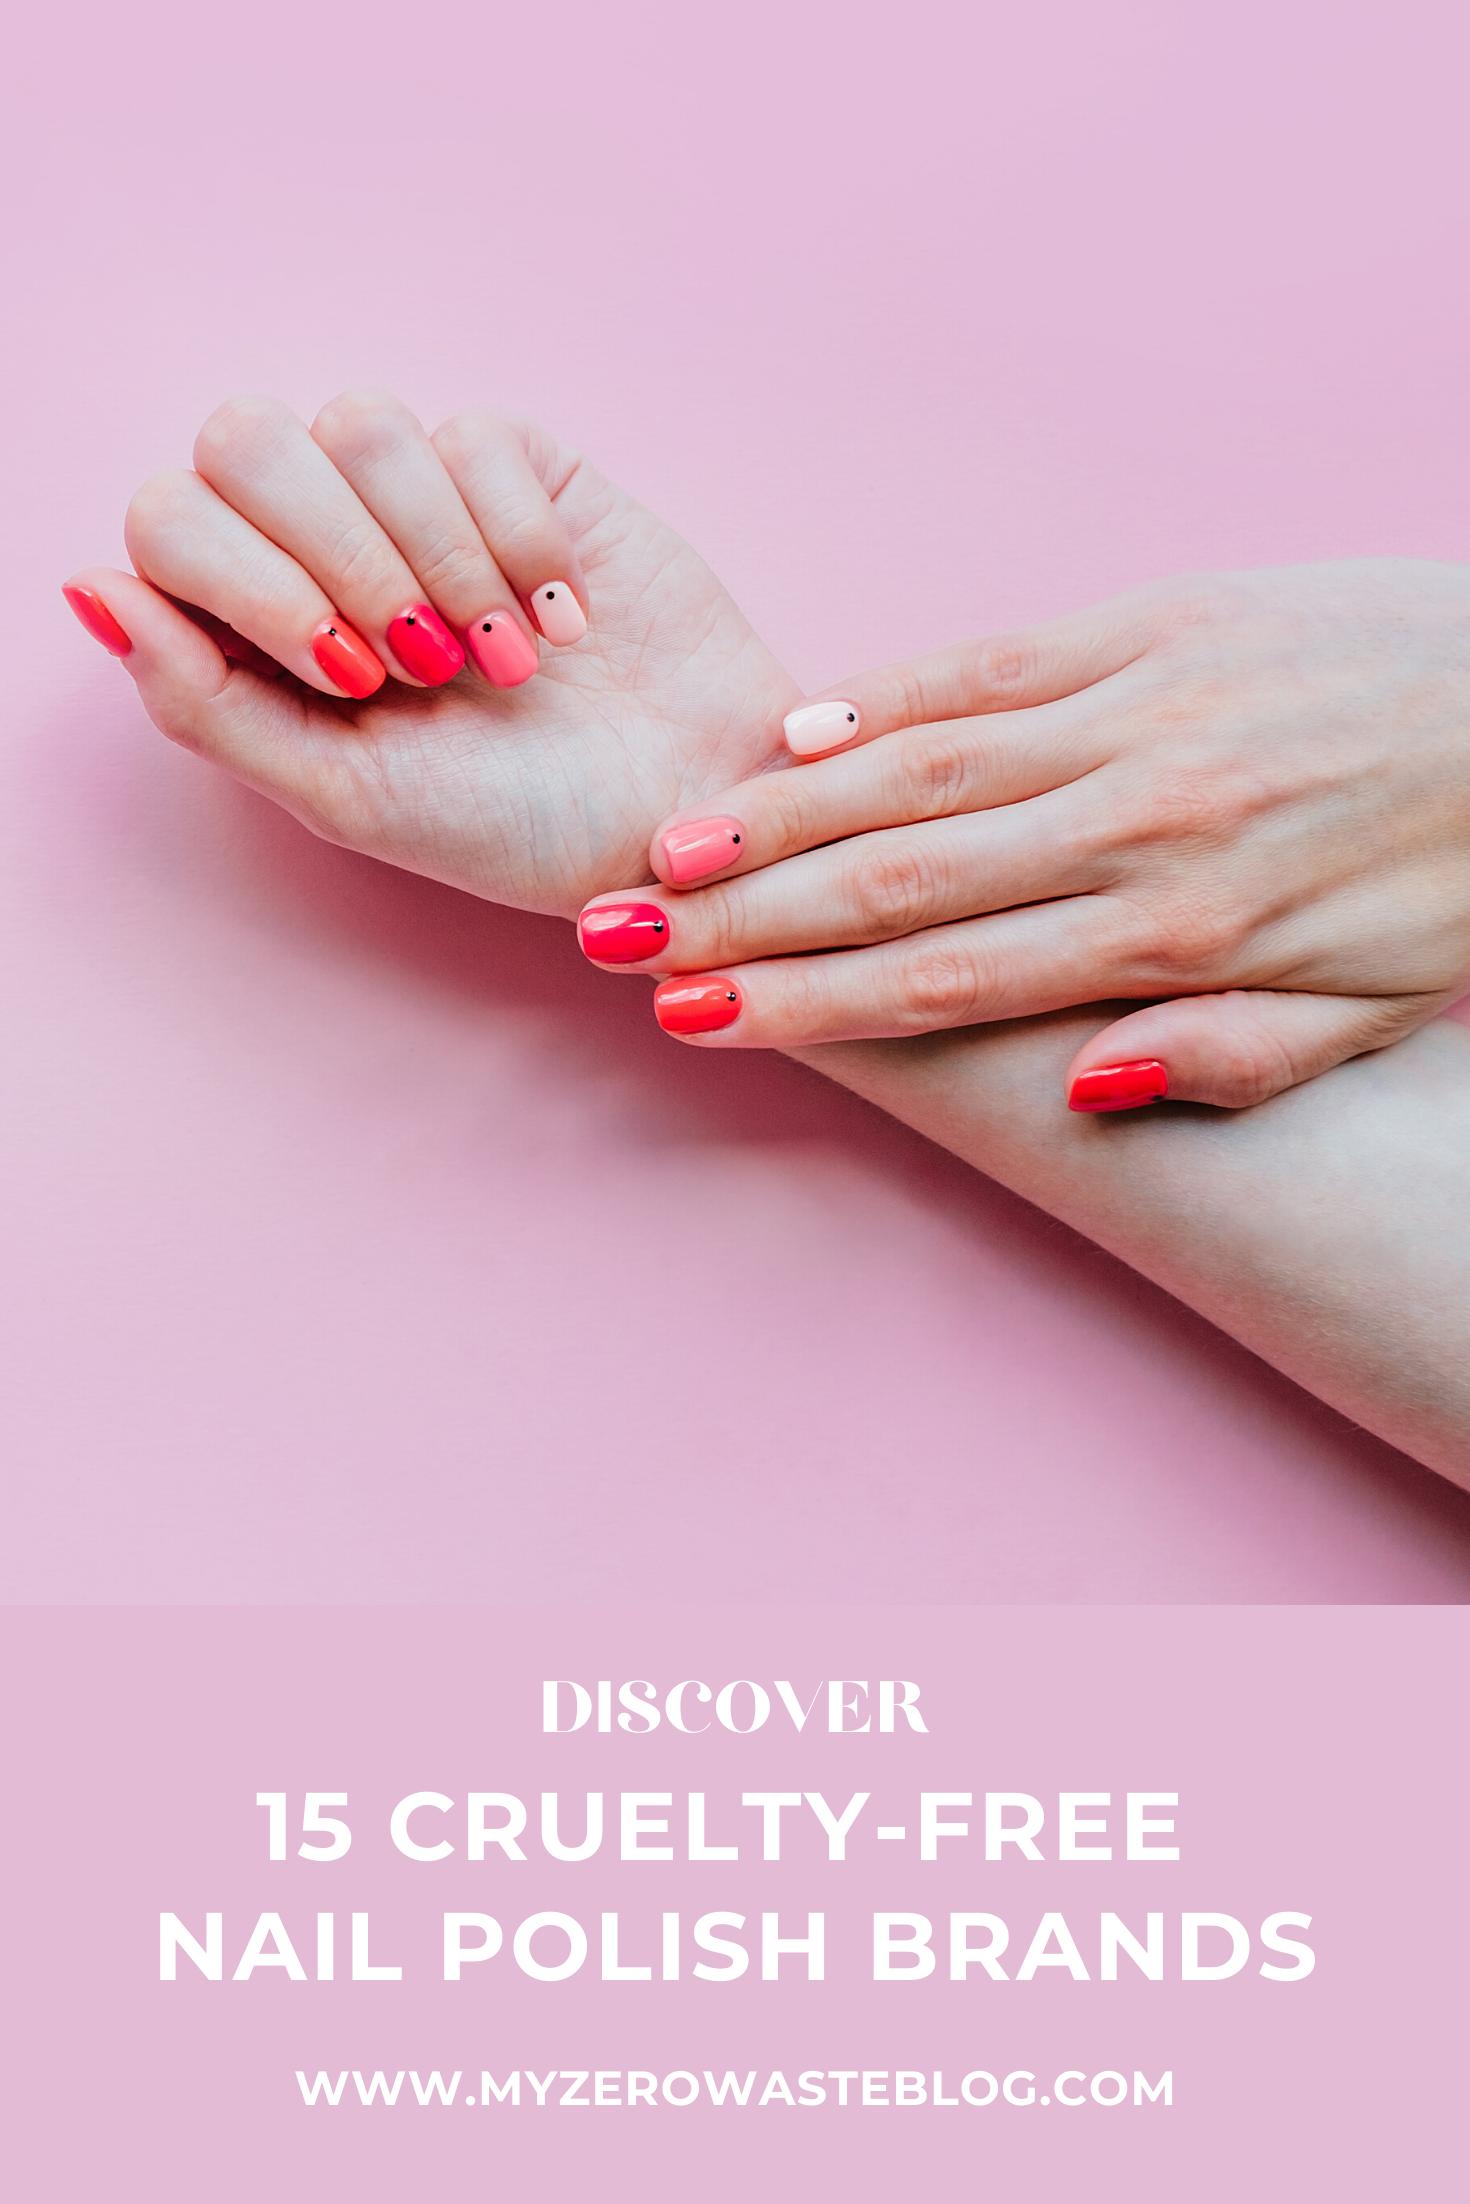 15 CrueltyFree Nail Polish Brands in 2020 Cruelty free